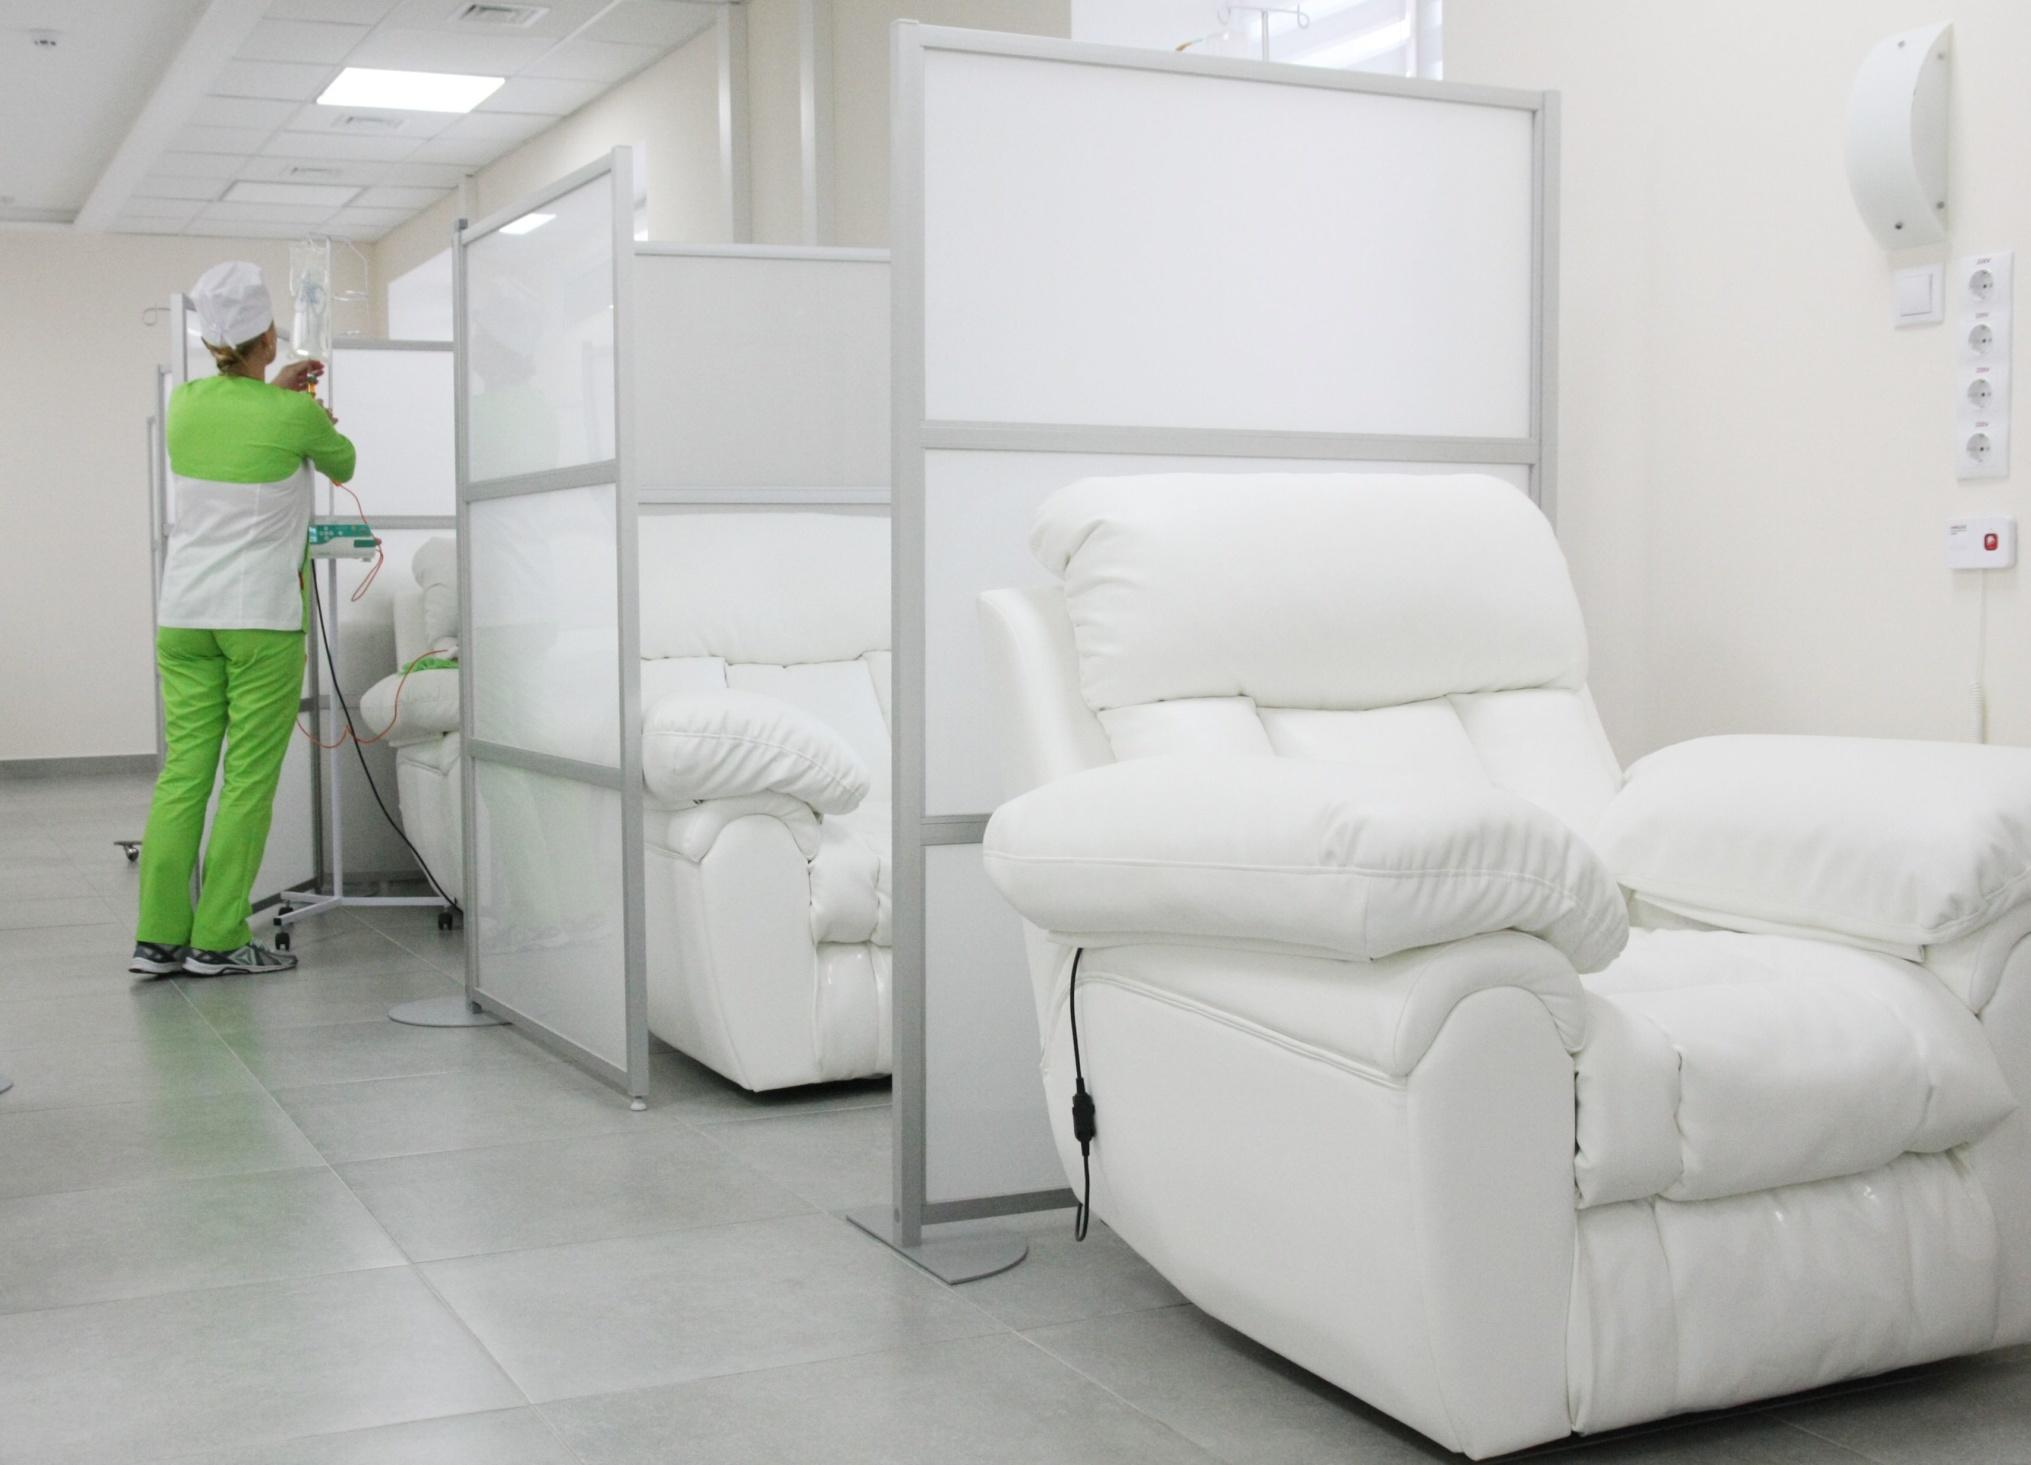 химиотерапия томоклиник